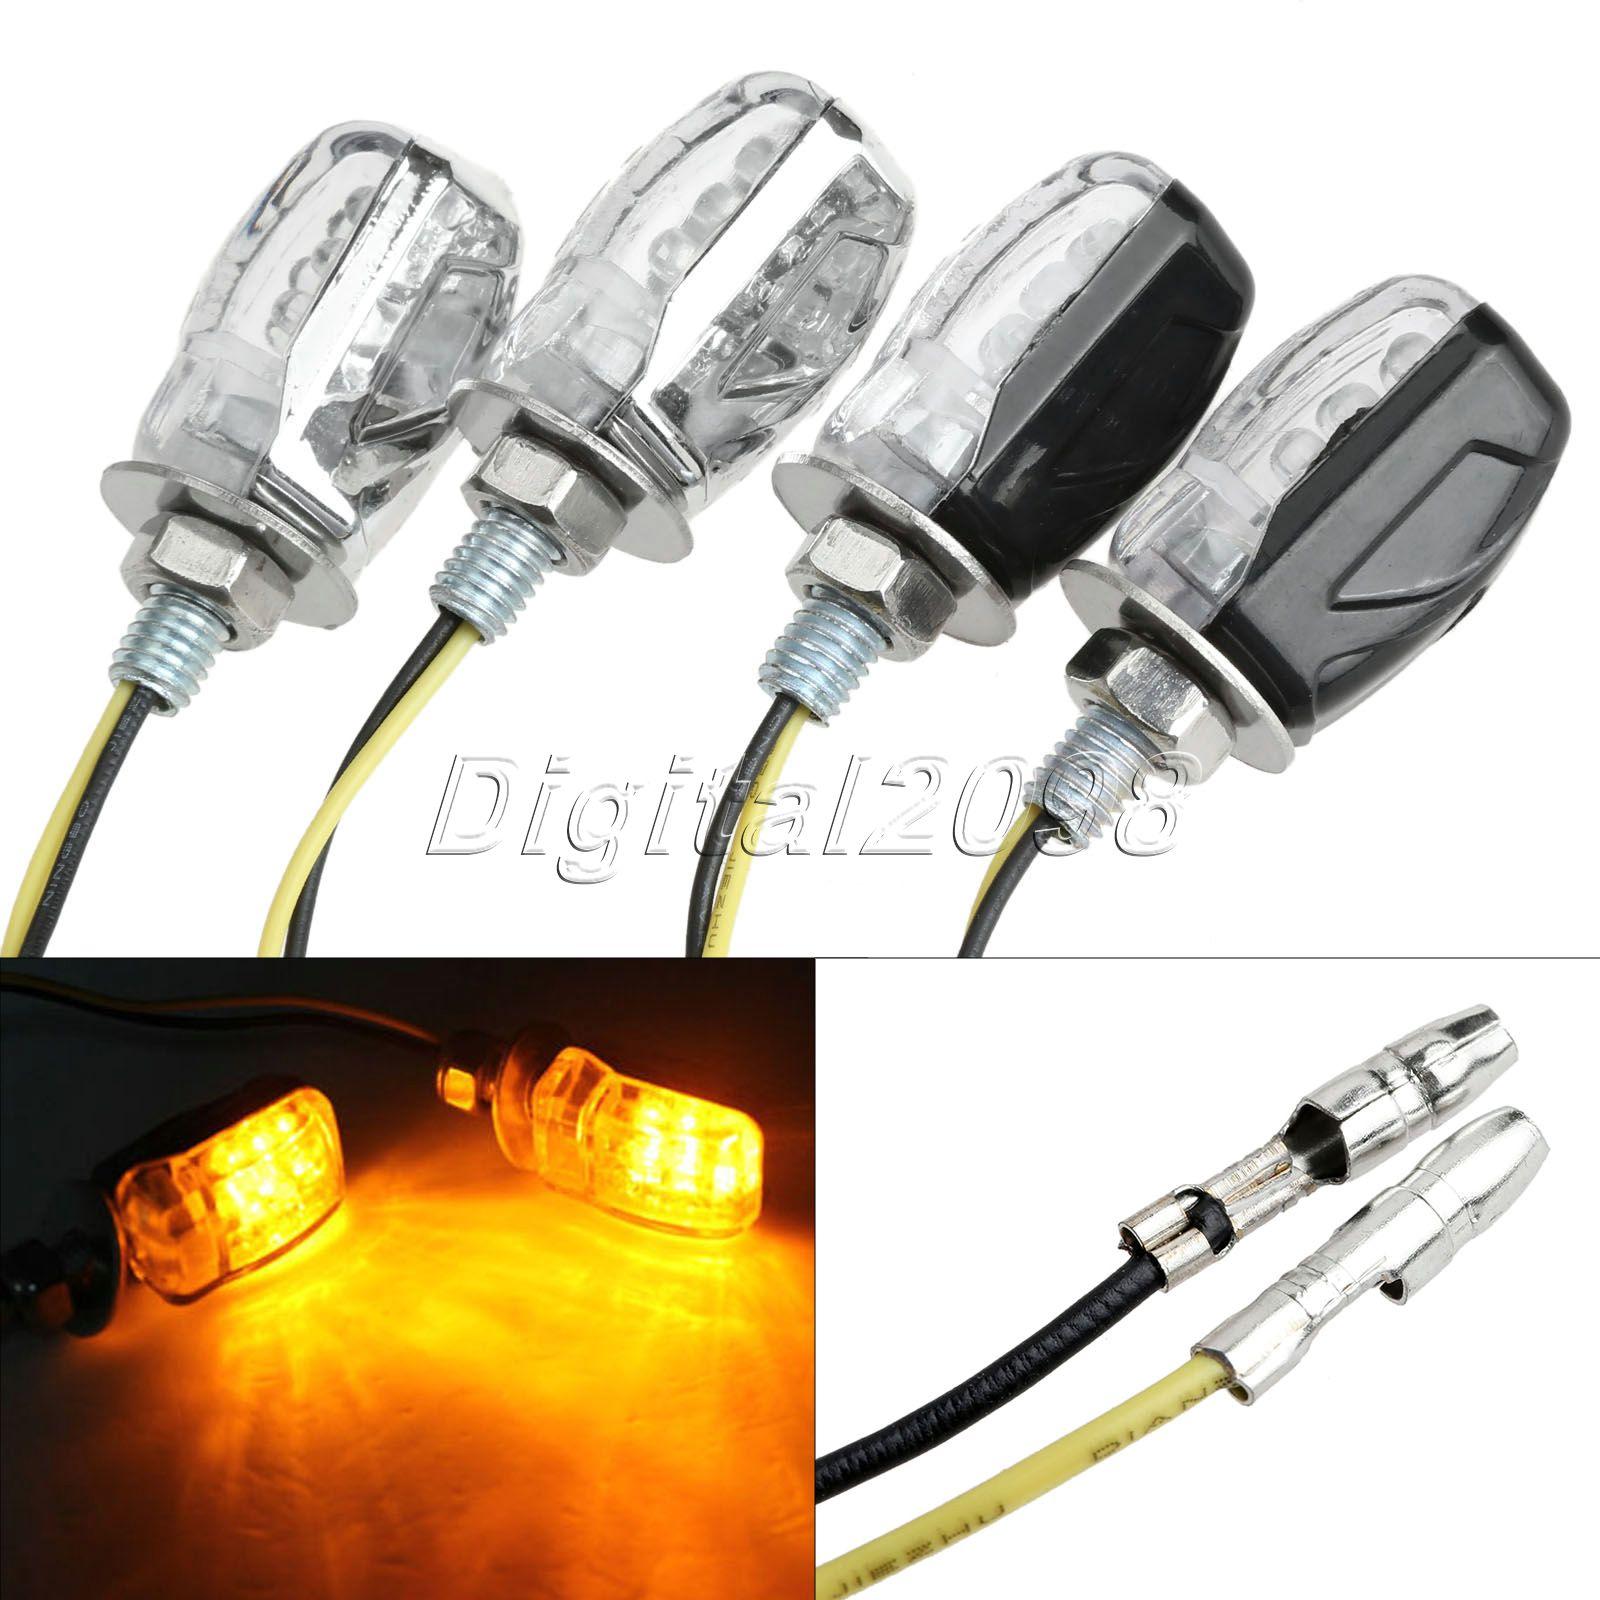 2x Motorcycle 6 LED Turn Signal Indicator Light Amber Blinkers Flashers For Ducati Harley Davidson Honda Kawasaki Suzuki Yamaha